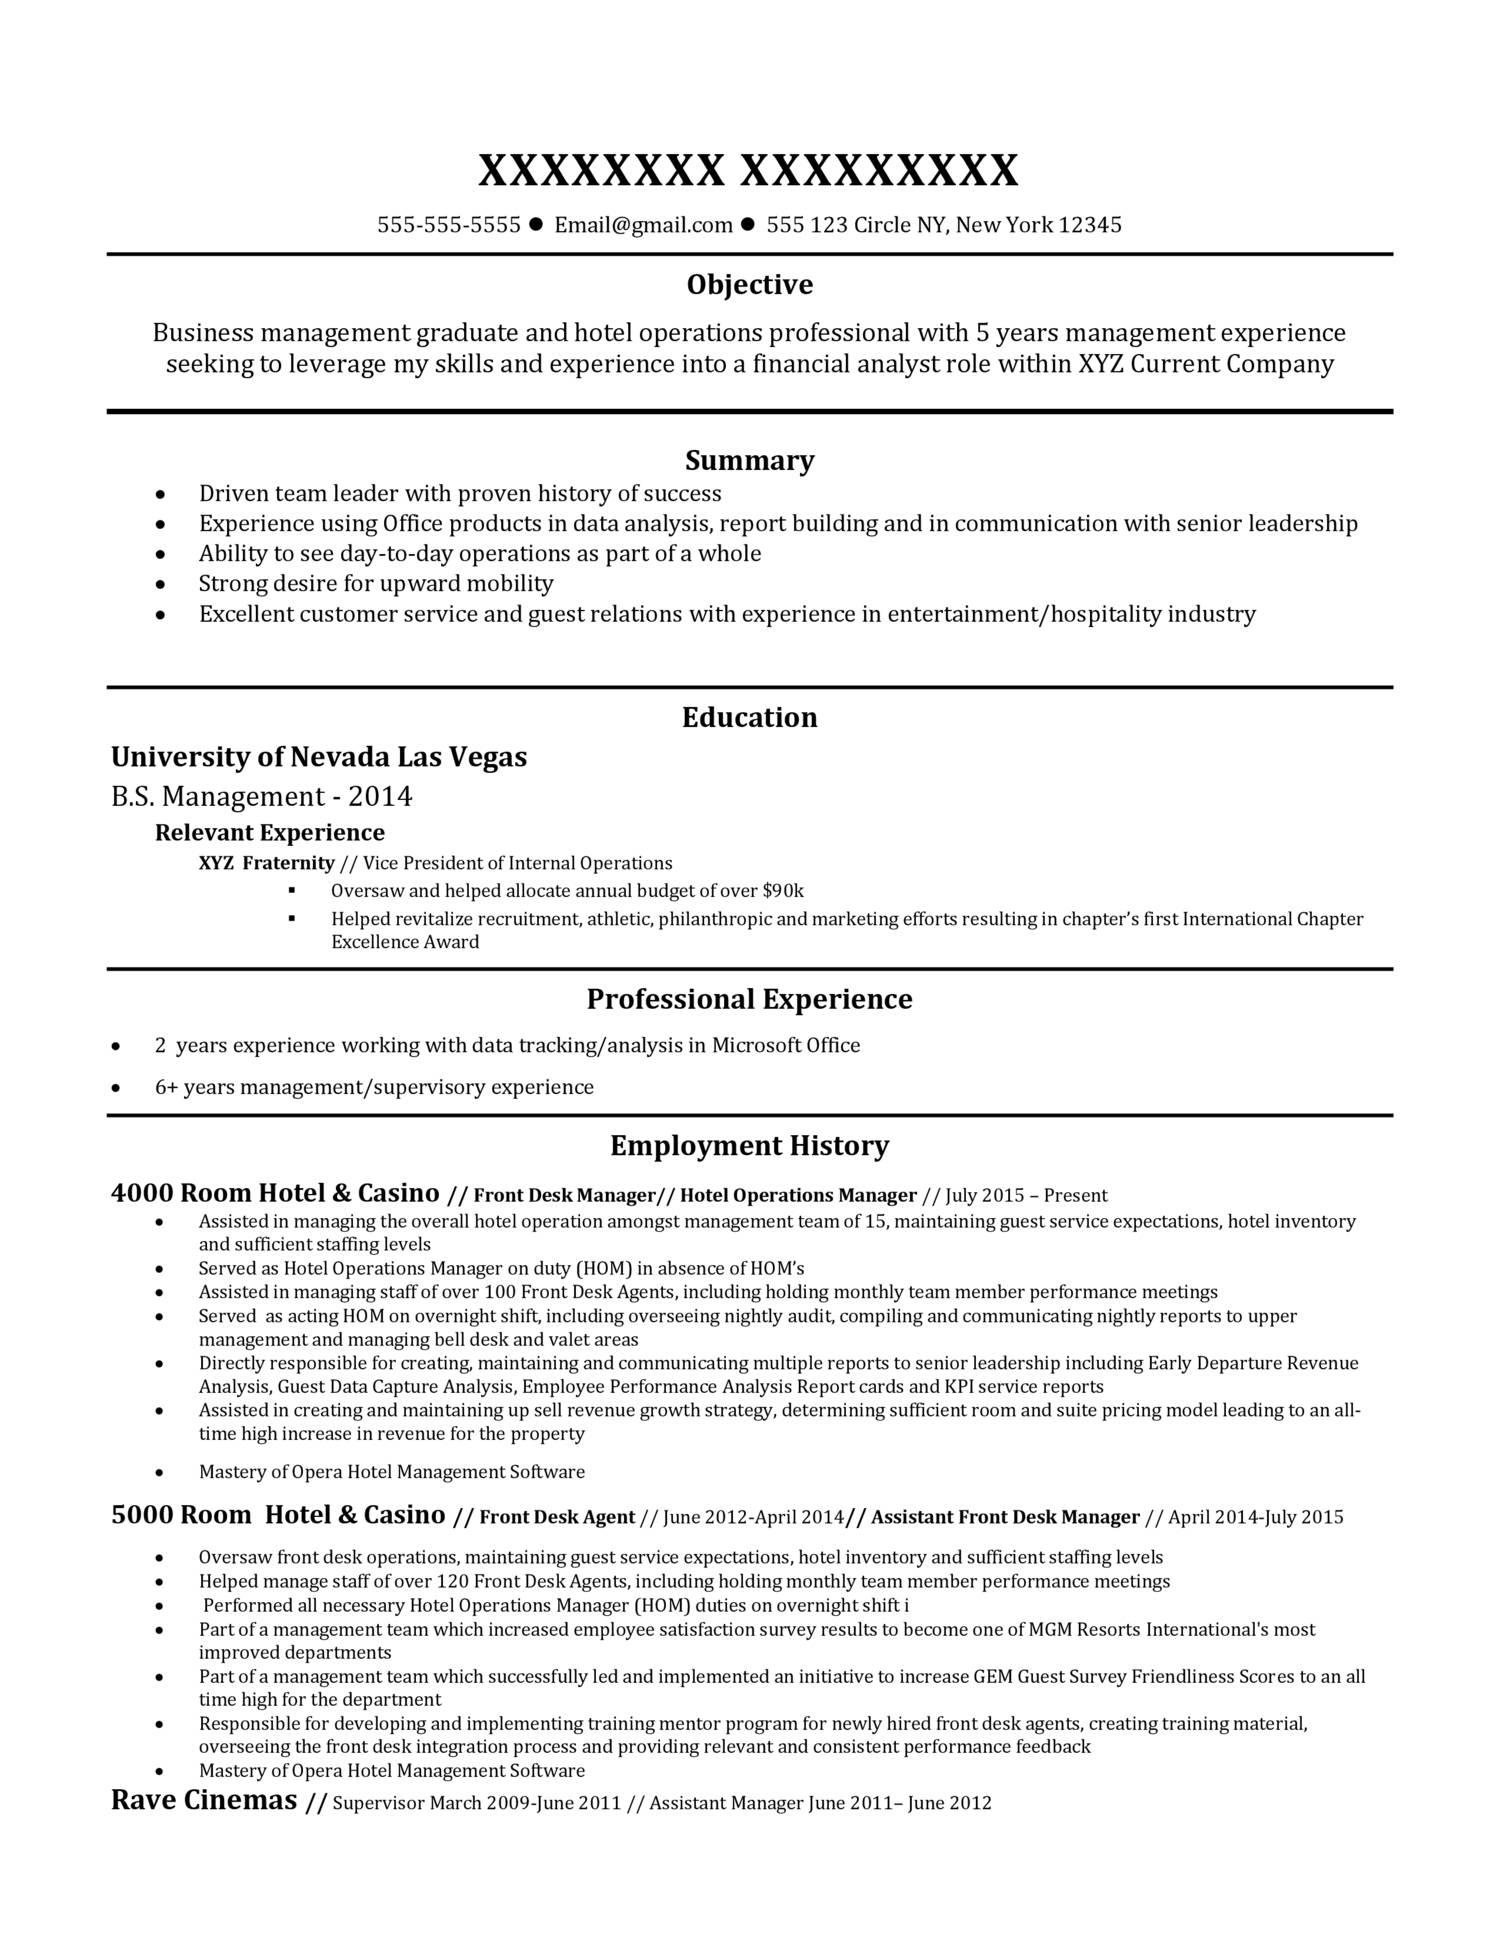 reddit resume reviewdocx  docdroid